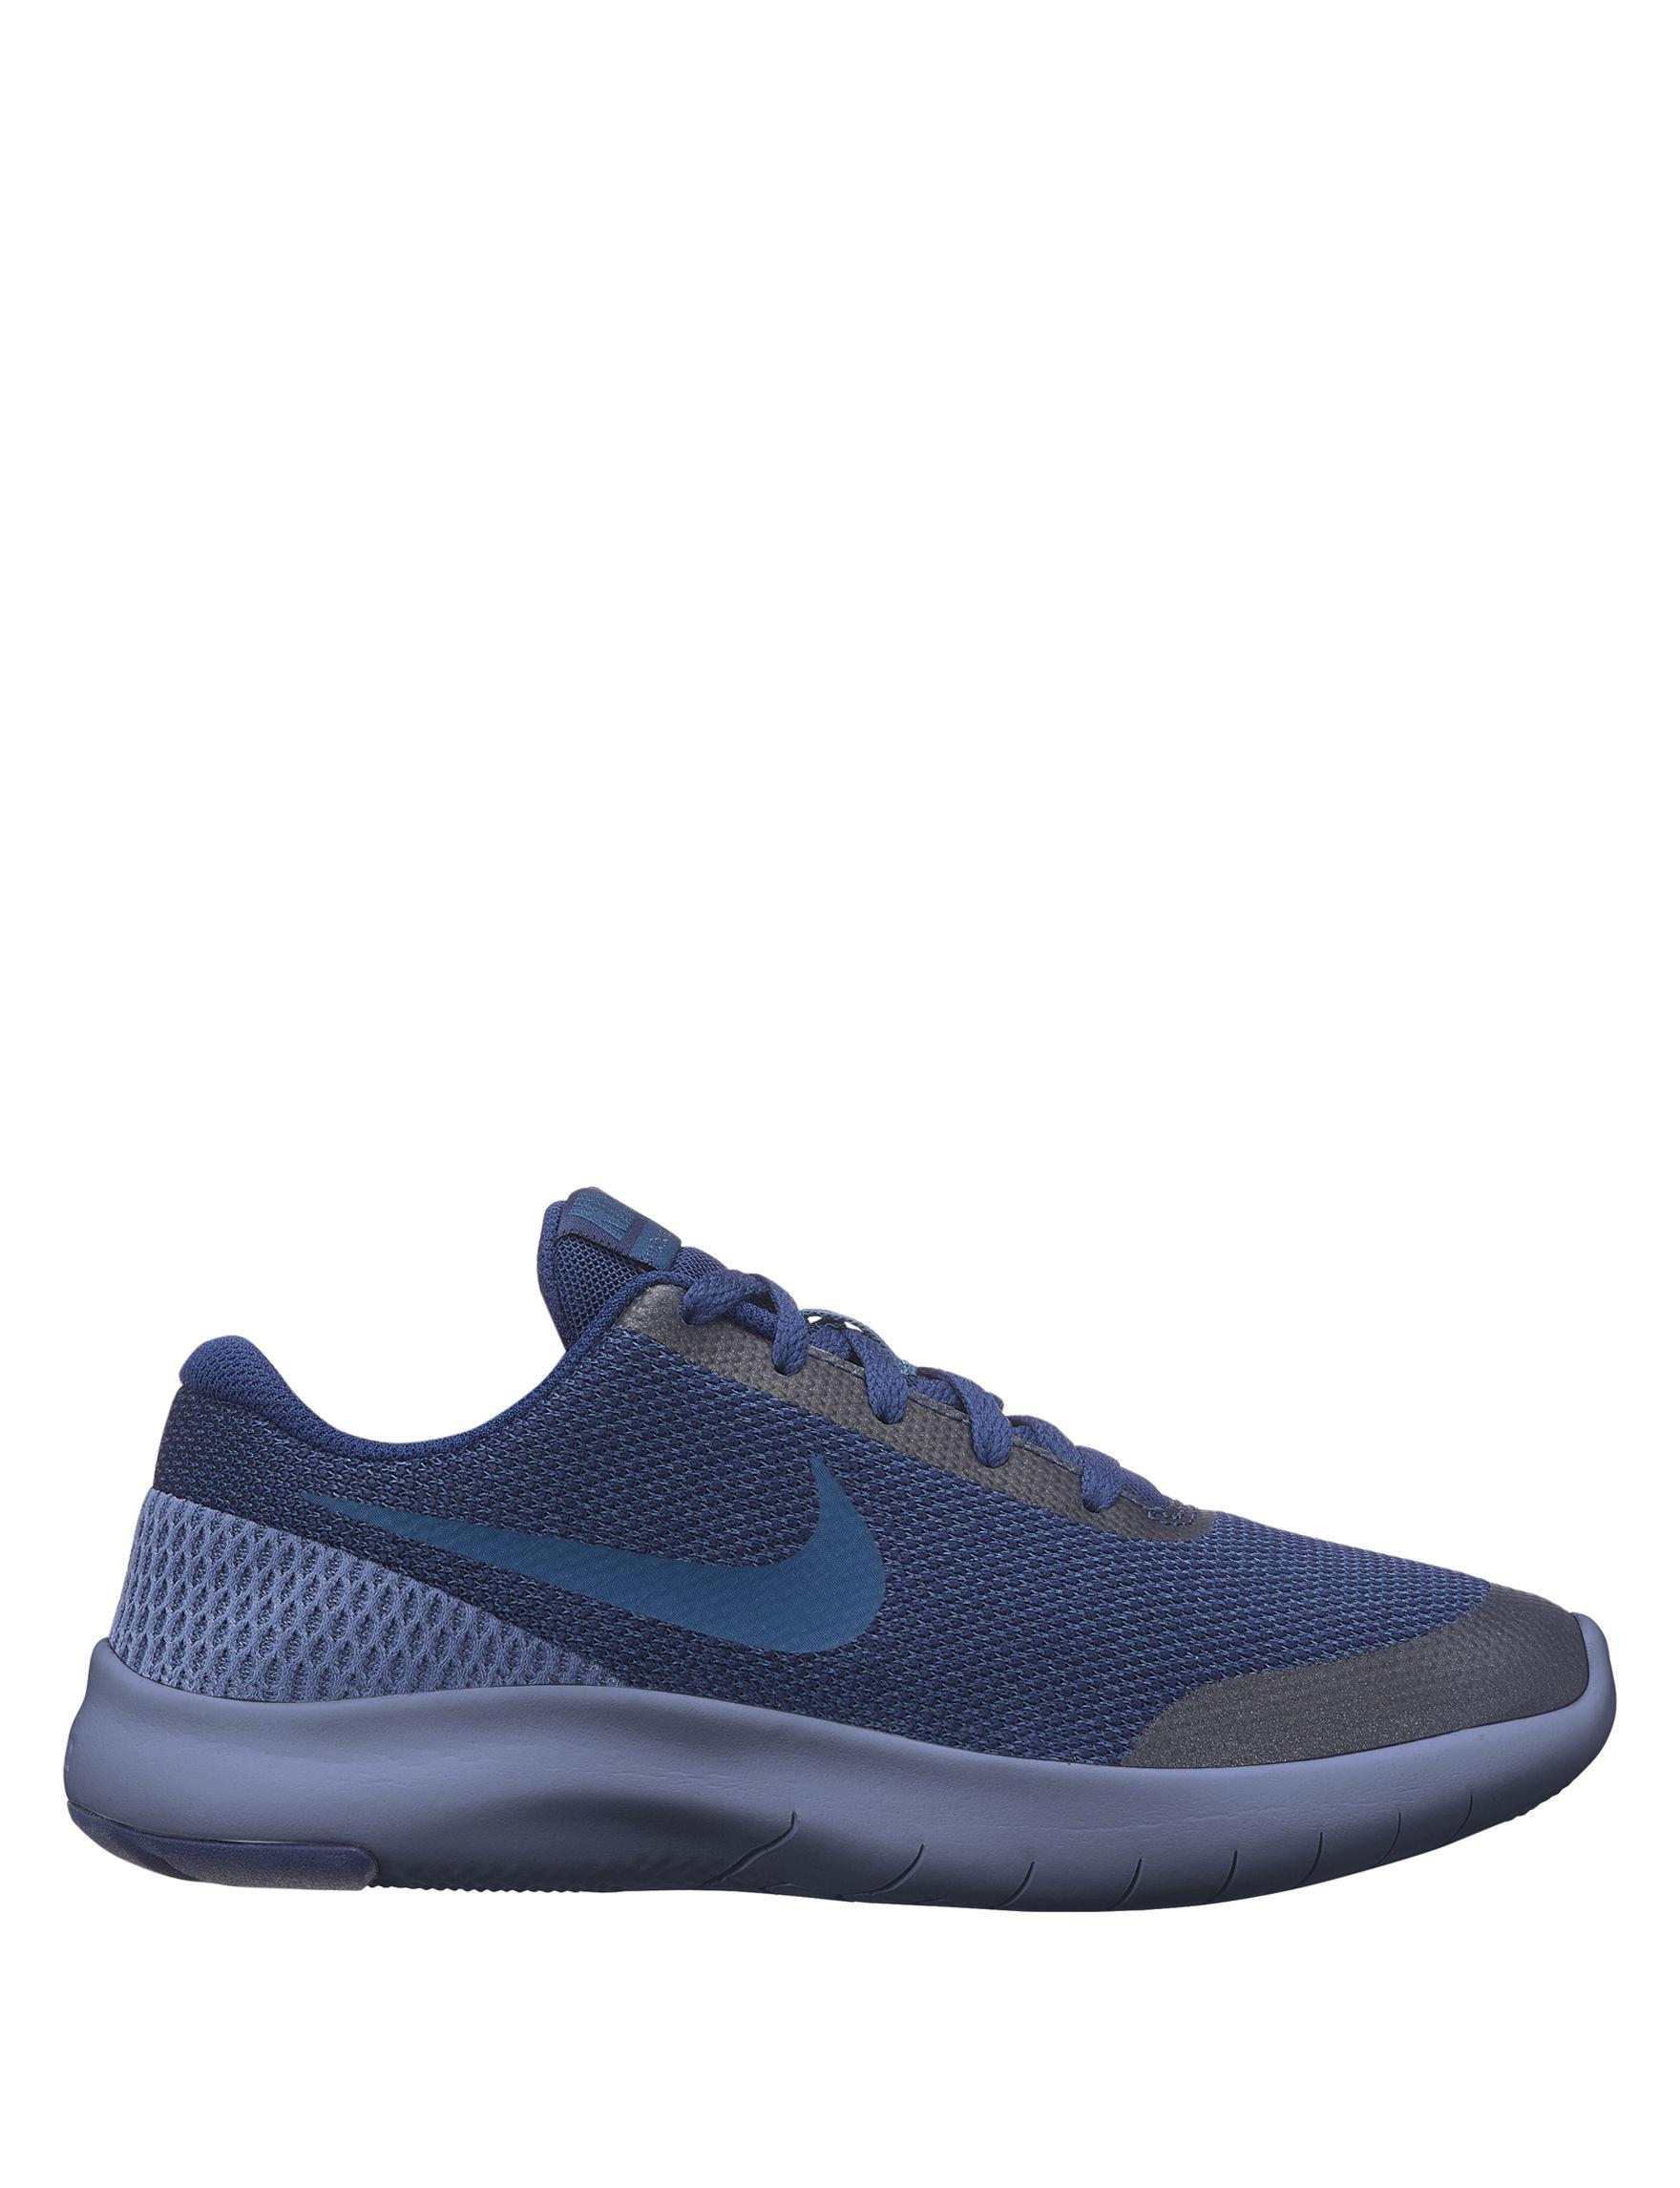 Nike Flex Experience Run 7 Running Shoes - Boys 4-7 - Navy - 7 72ceb2652